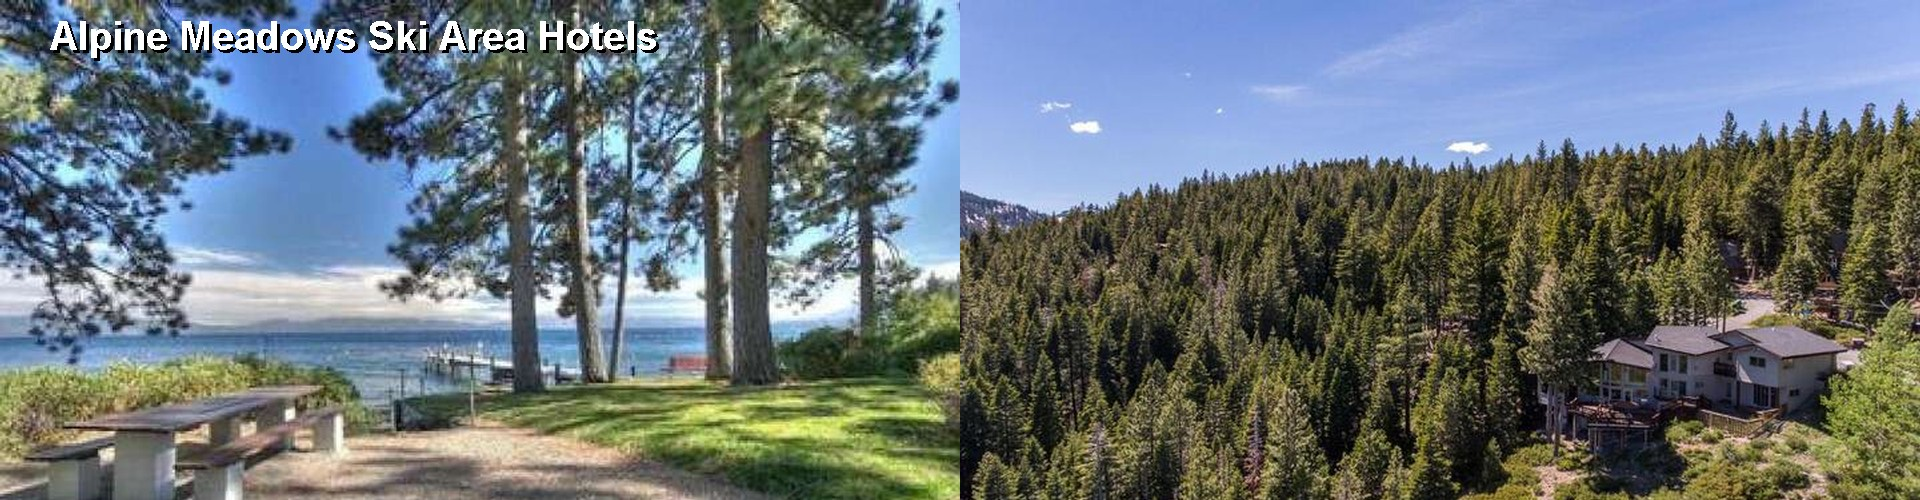 $63+ hotels near alpine meadows ski area in lake tahoe nv